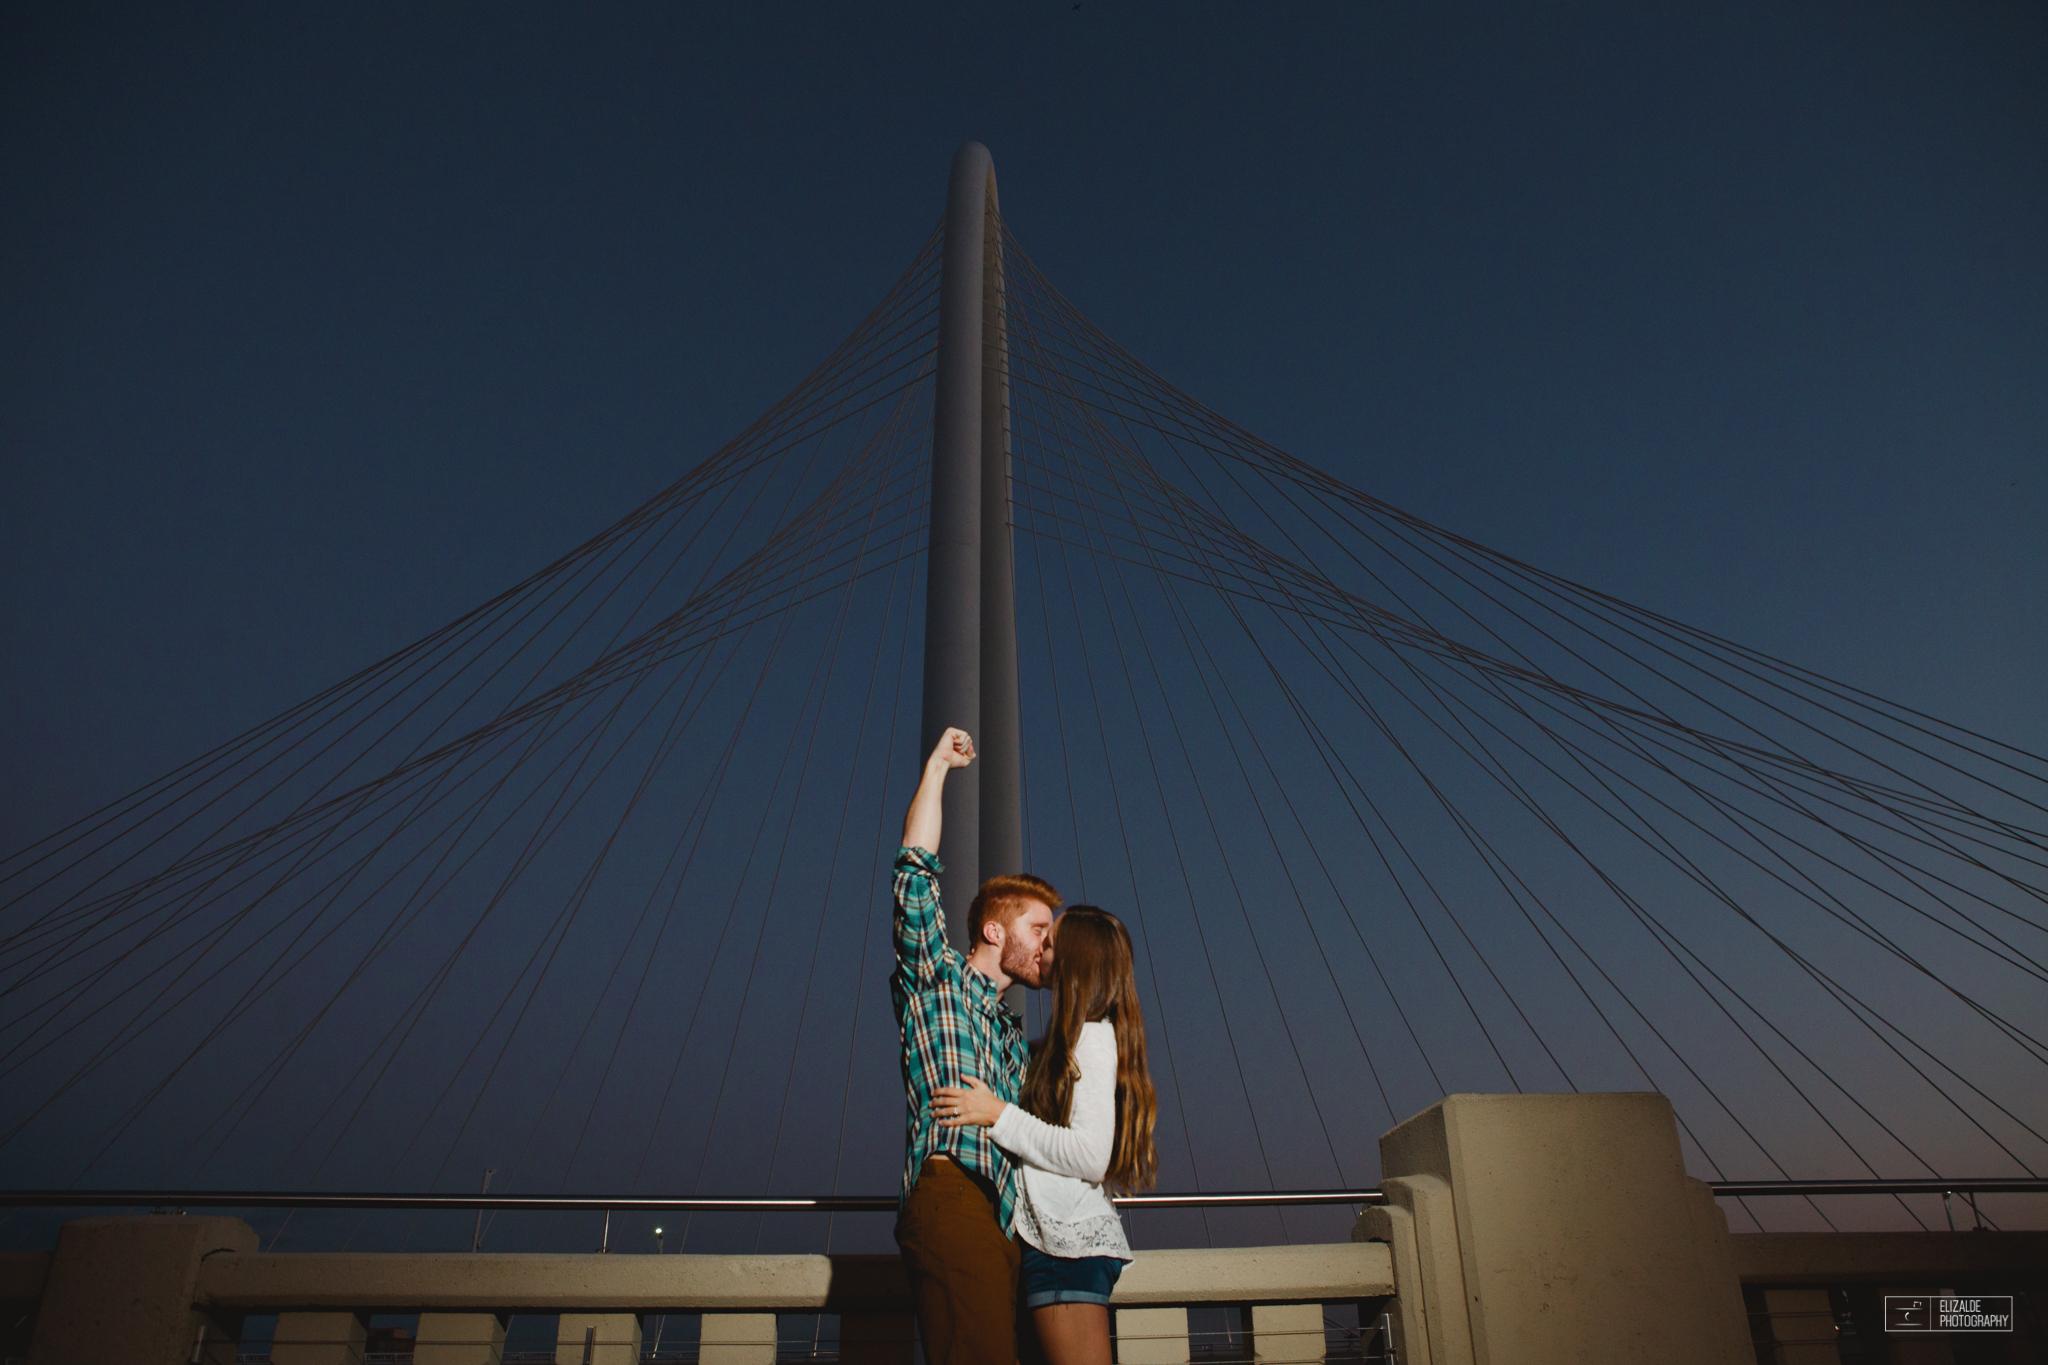 Proposal_DFW Wedding Photographer_Dallas Photographer_Elizalde Photography_margaret hunt hill bridge (18 of 21).jpg